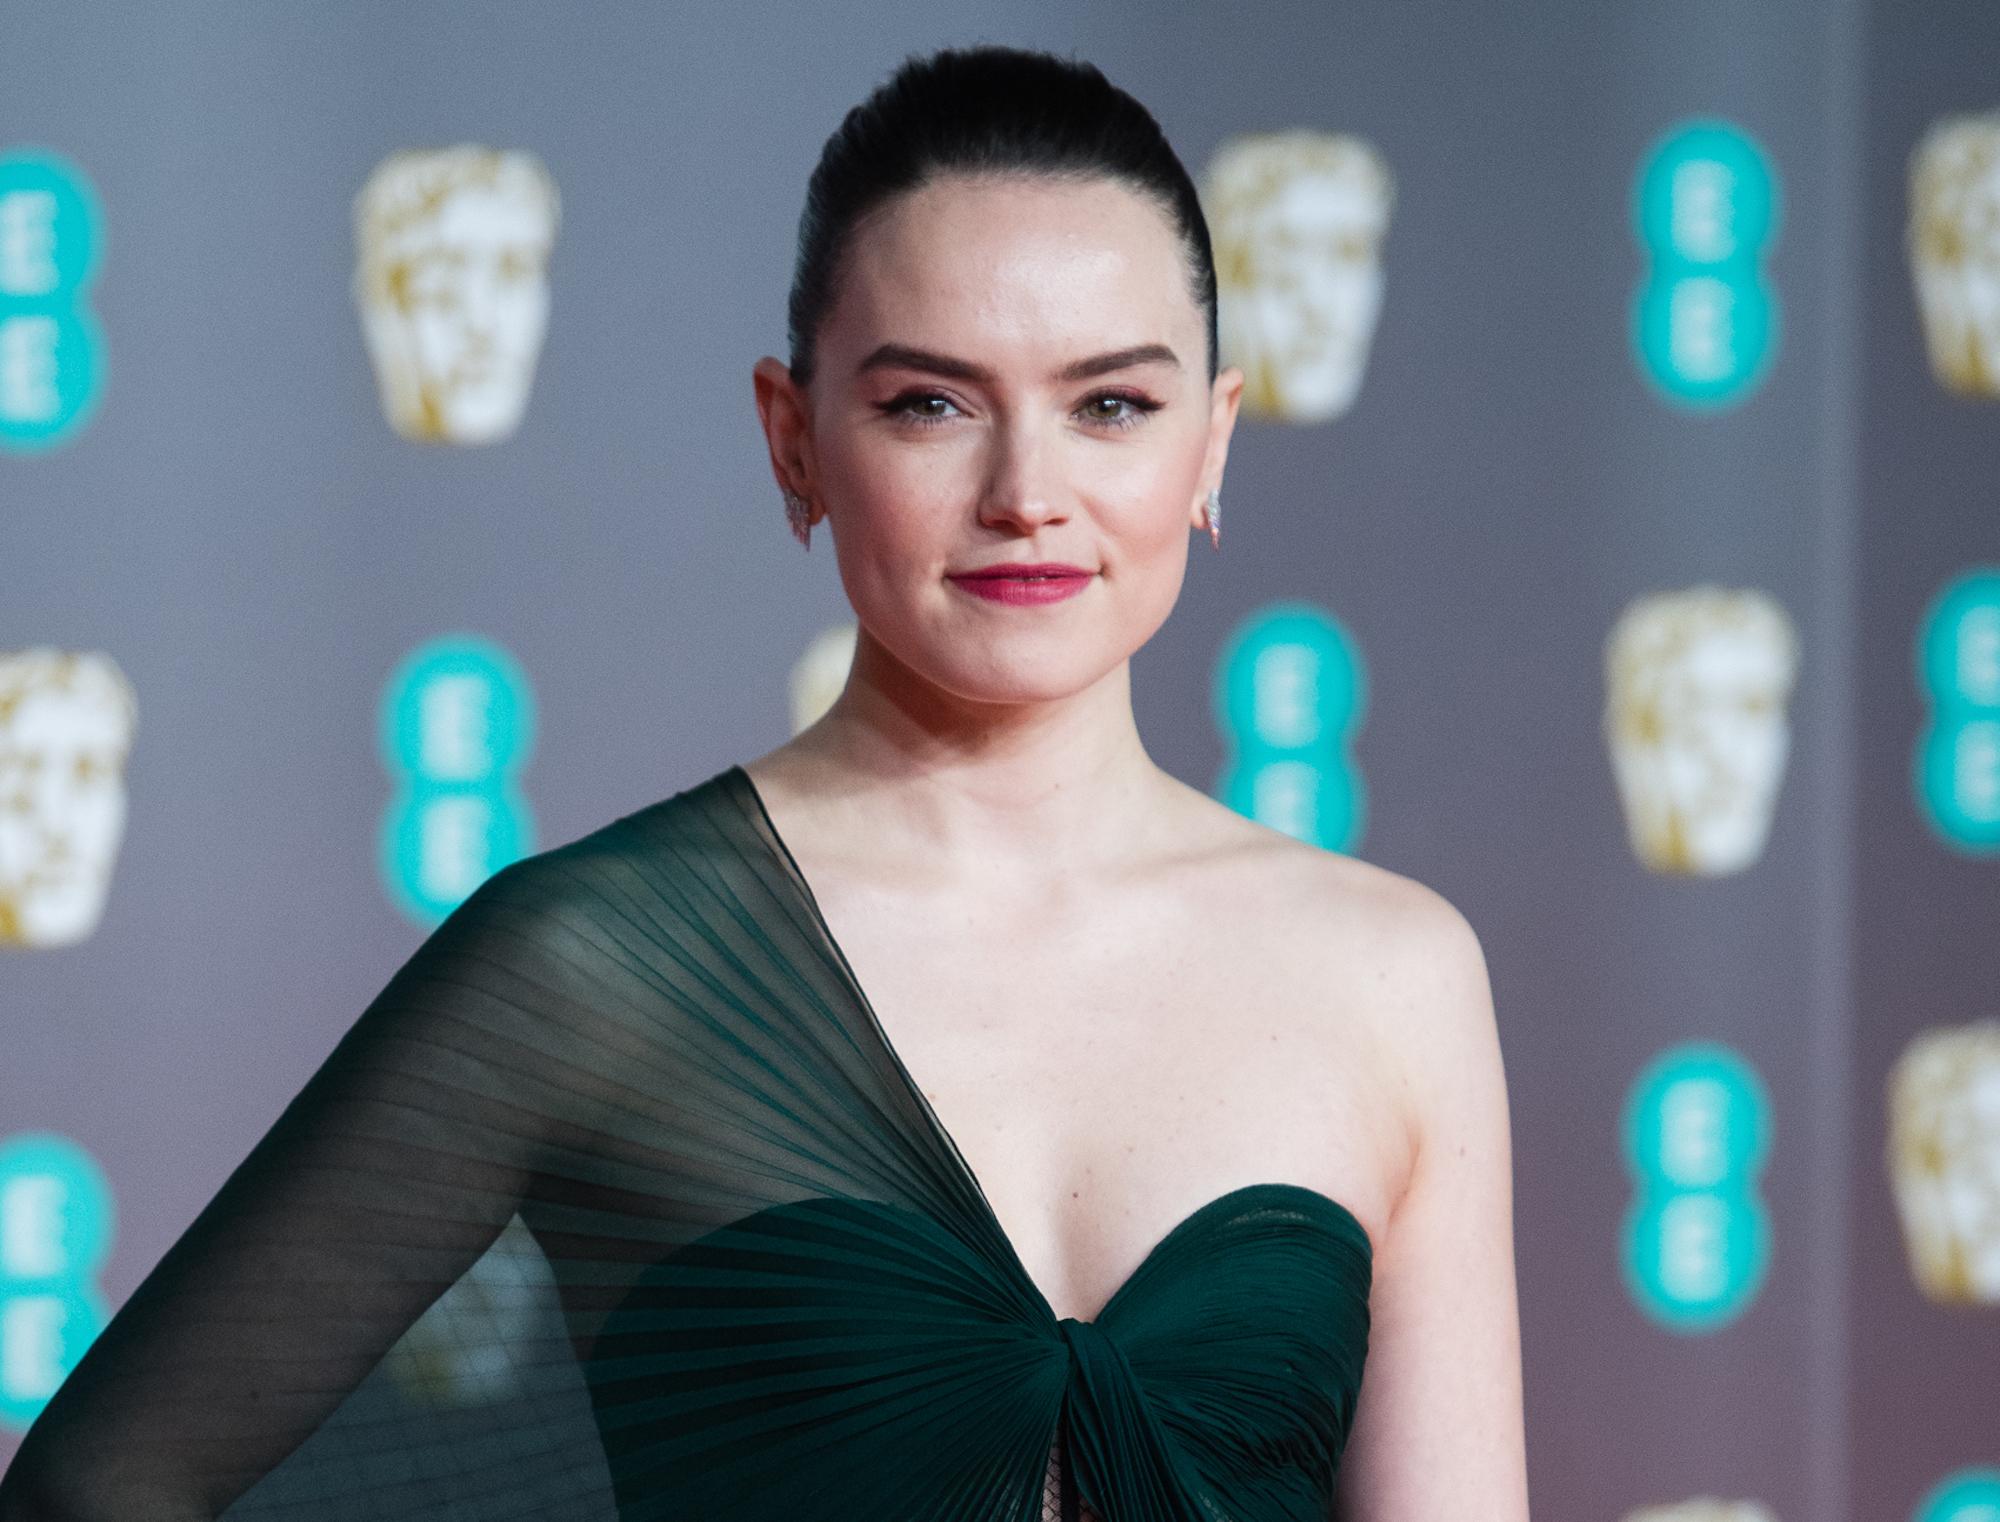 Daisy Ridley at the EE British Academy Film Awards 2020 at Royal Albert Hall on Feb. 02, 2020.